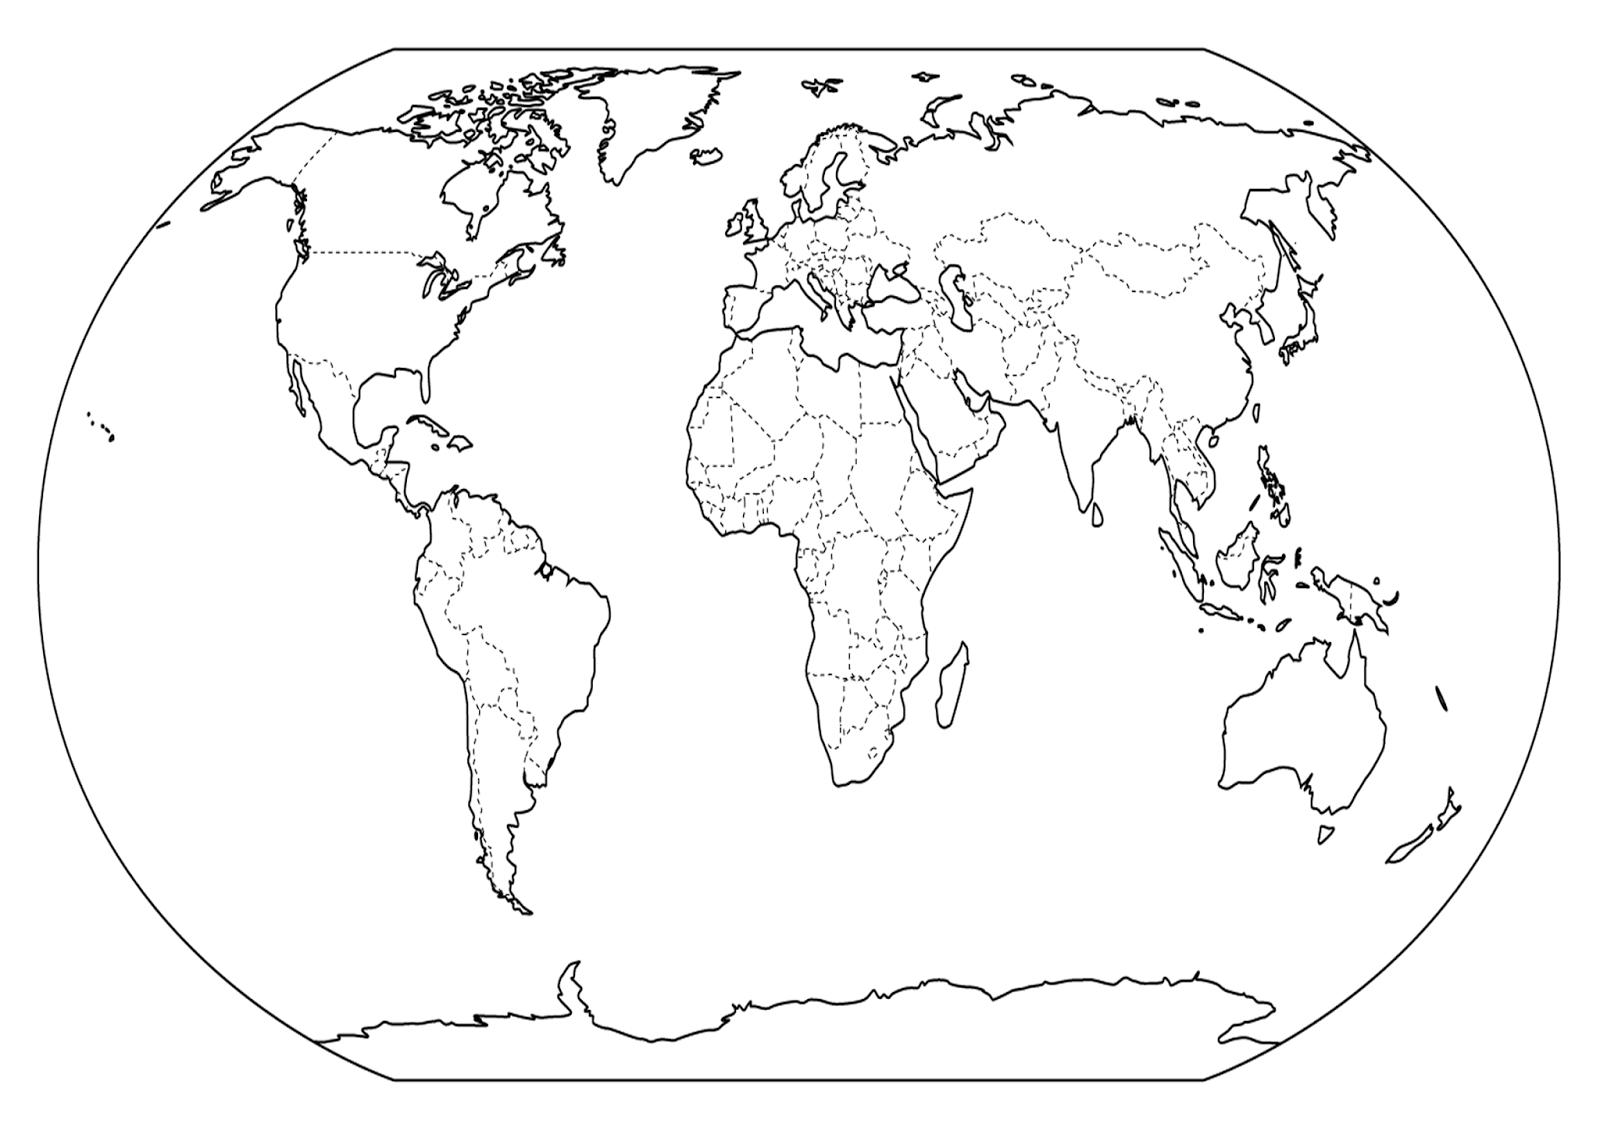 En Y Mundo Mapa De Dibujo Negro Del Blanco